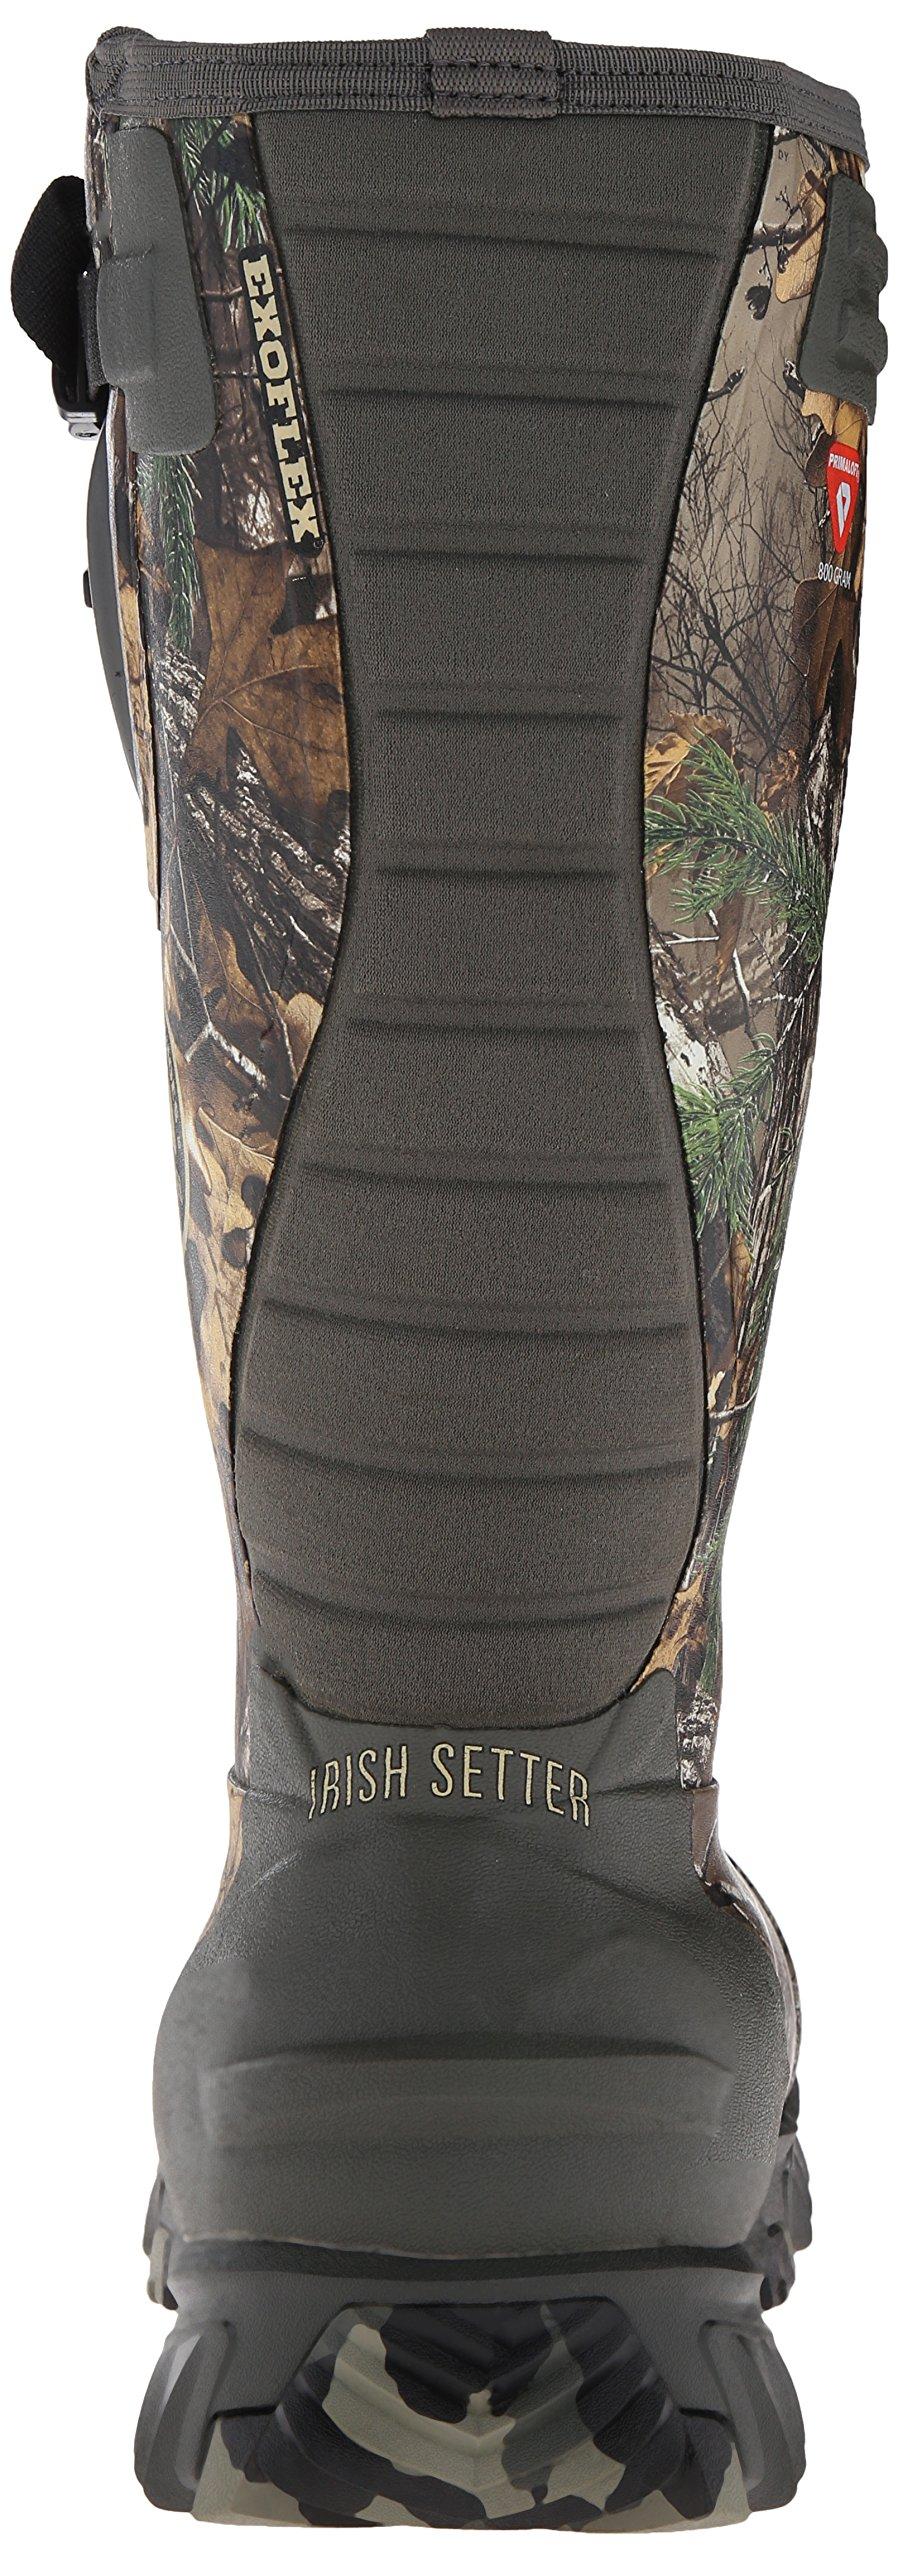 Irish Setter Men's 4881 Rutmaster 2.0 17'' 800-Gram Rubber Boot, Camo, 8 E US by Irish Setter (Image #2)